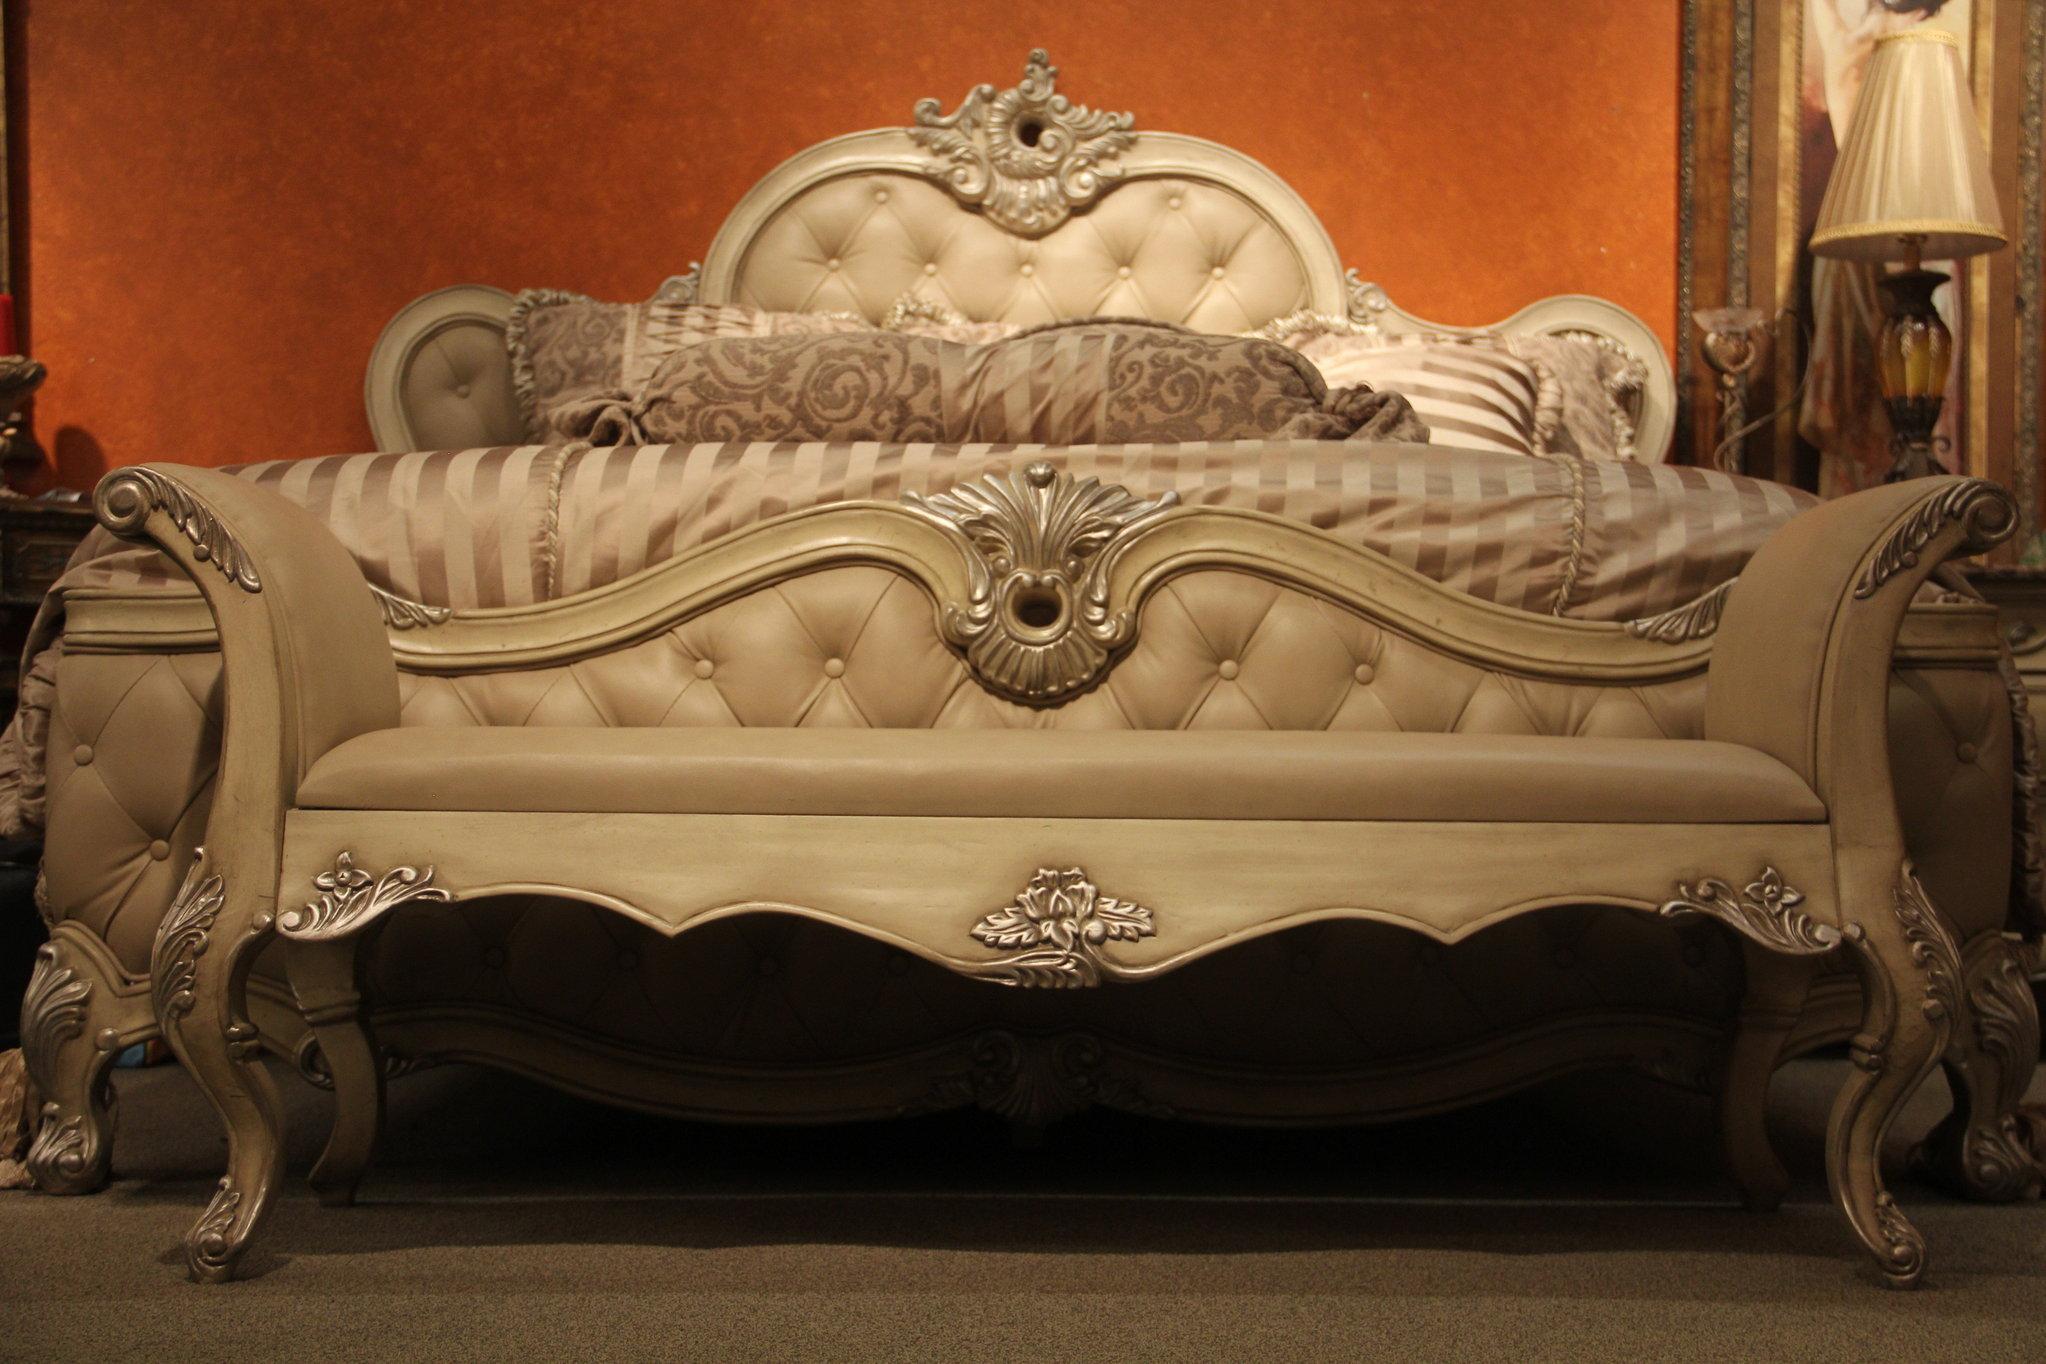 black ornate bedroom furniture photo - 7